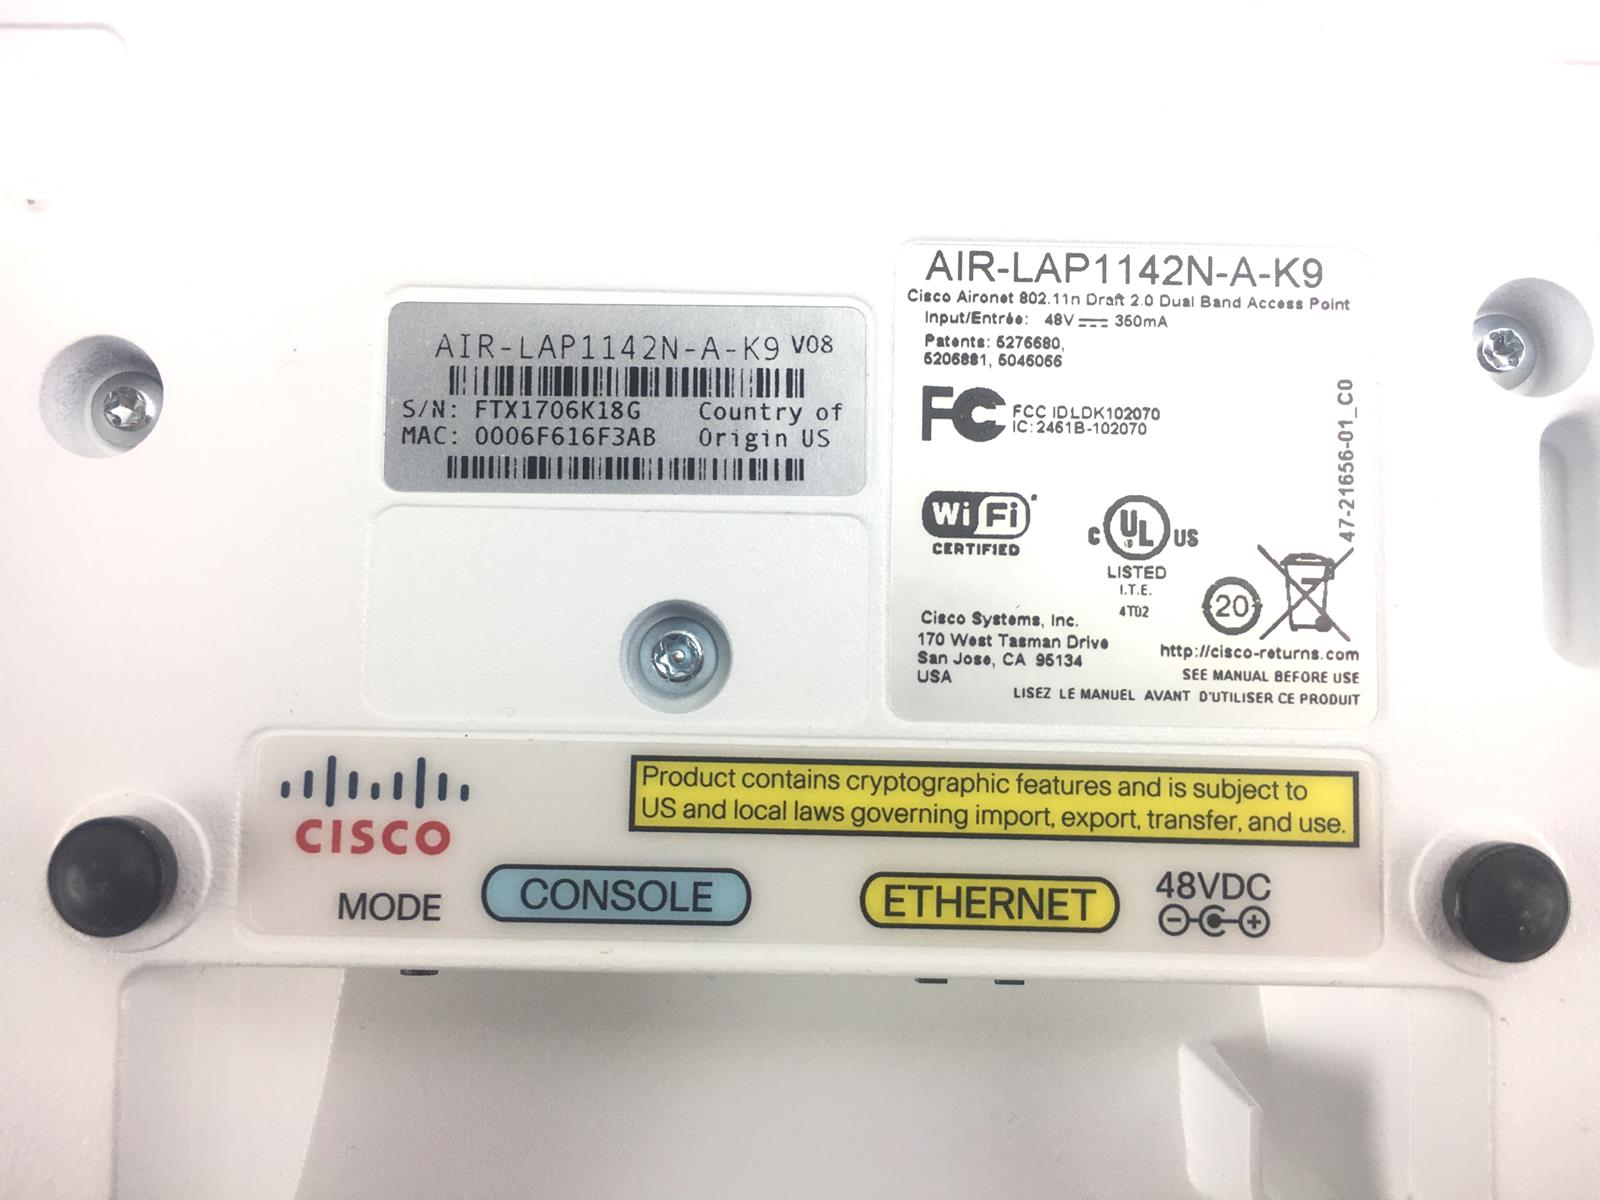 Details about Cisco AIR-LAP1142N-A-K9 Aironet 1140 Wireless Access Point -  Lightweight Mode